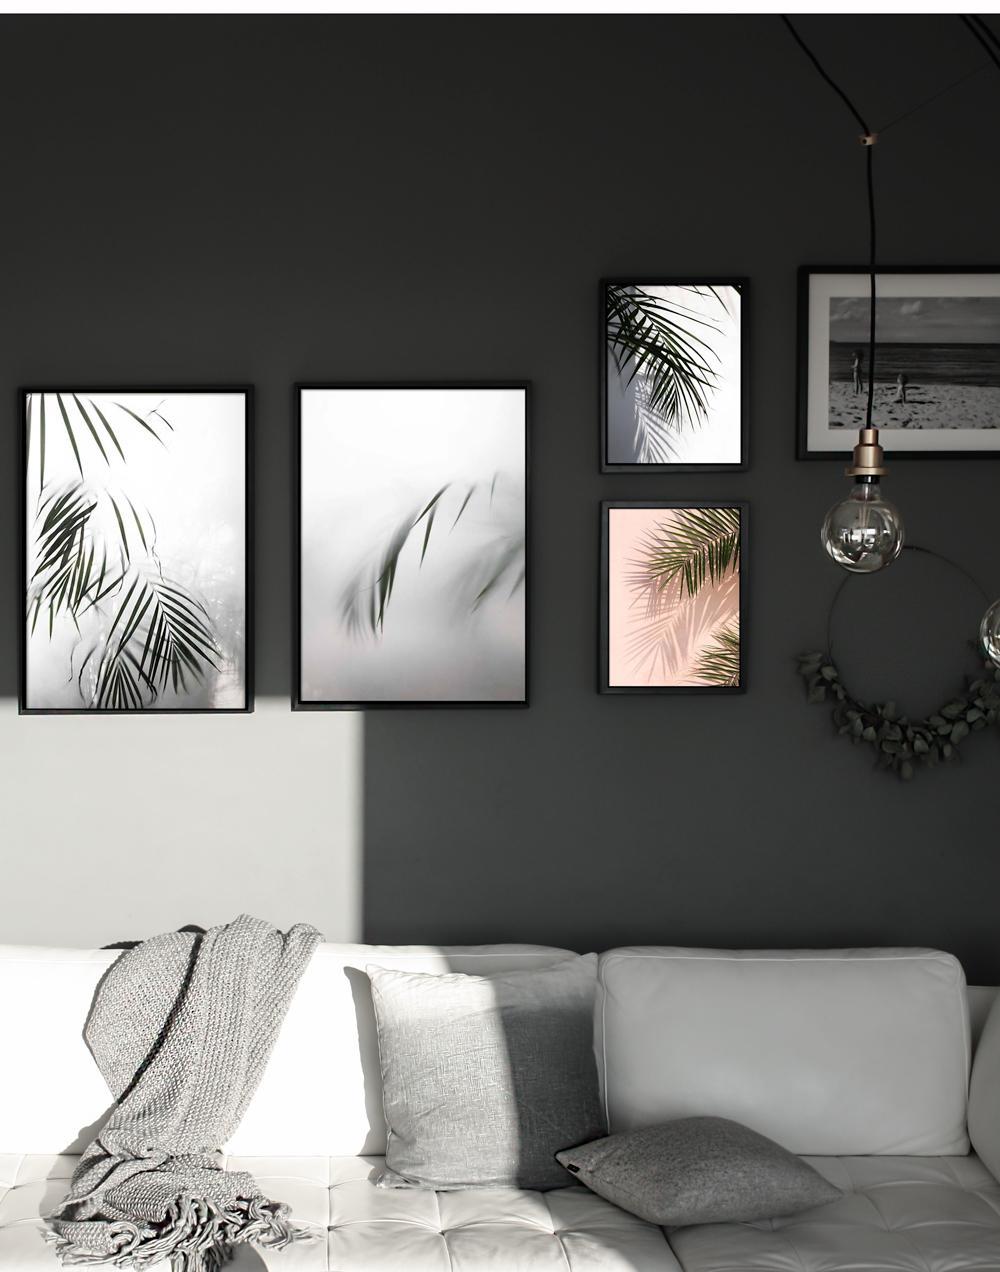 wanddeko bilder ideen couchstyle. Black Bedroom Furniture Sets. Home Design Ideas